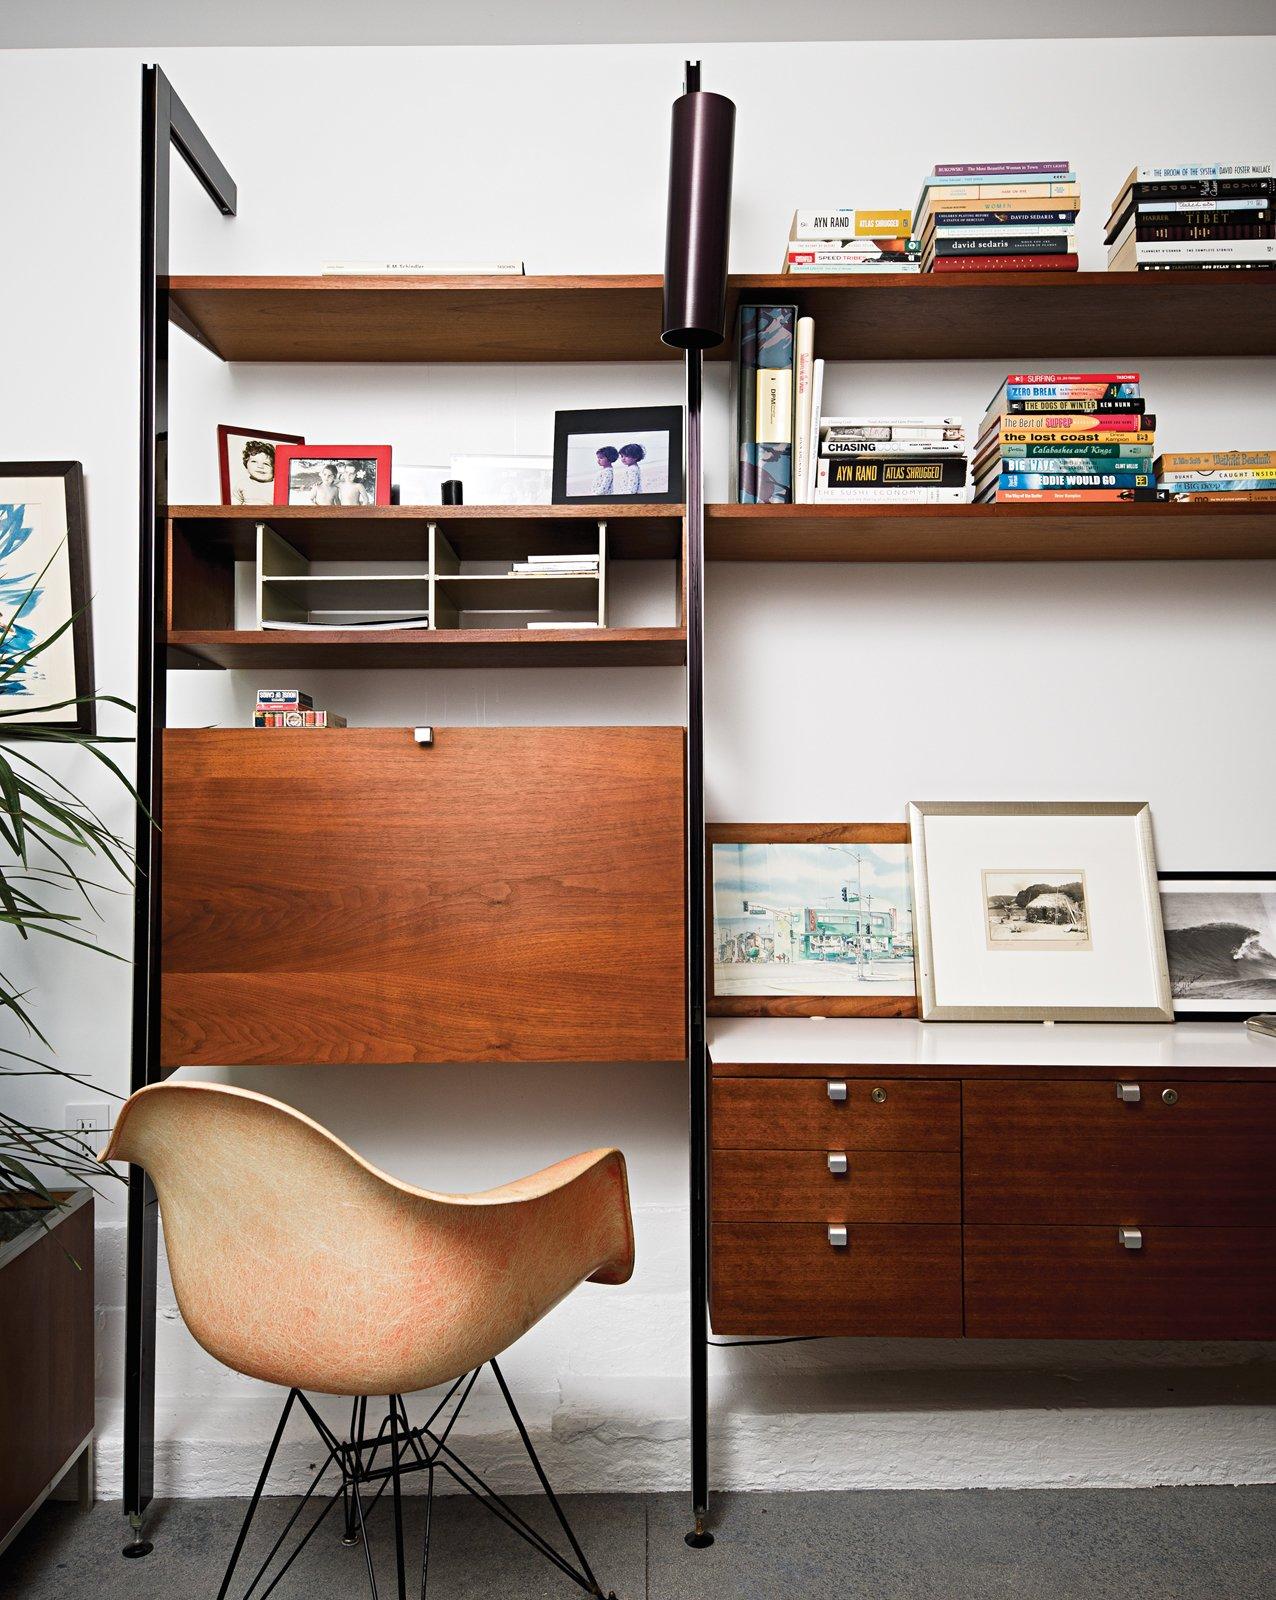 #seatingdesign #chair #Eames #shellchair #Gardena #California #MichaelLeeArchitects #midcenturymodern #desk #office #workplace #interior #inside  100+ Best Modern Seating Designs